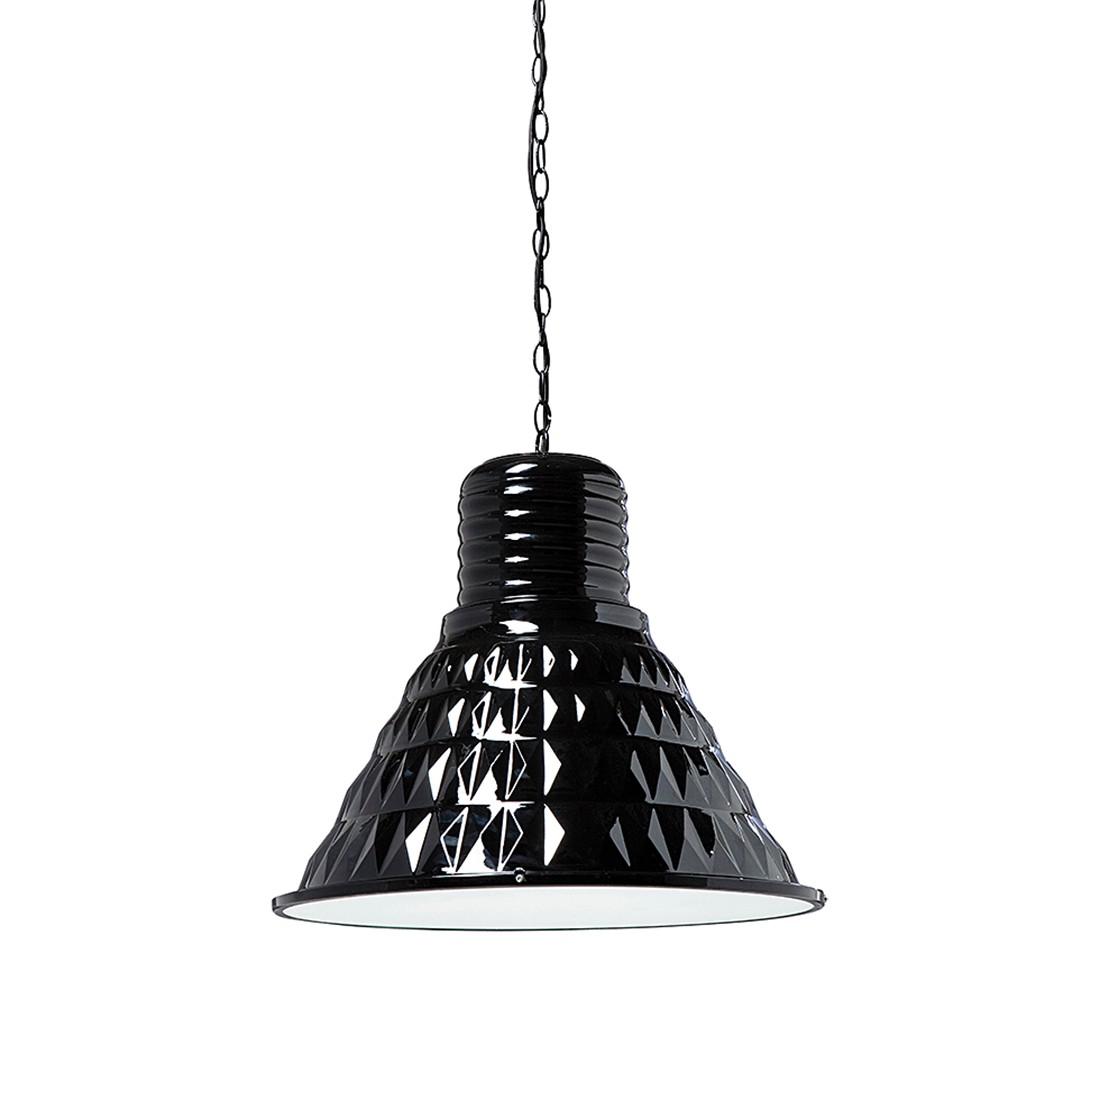 Haengeleuchte Prisma - Aluminium Schwarz, Kare Design